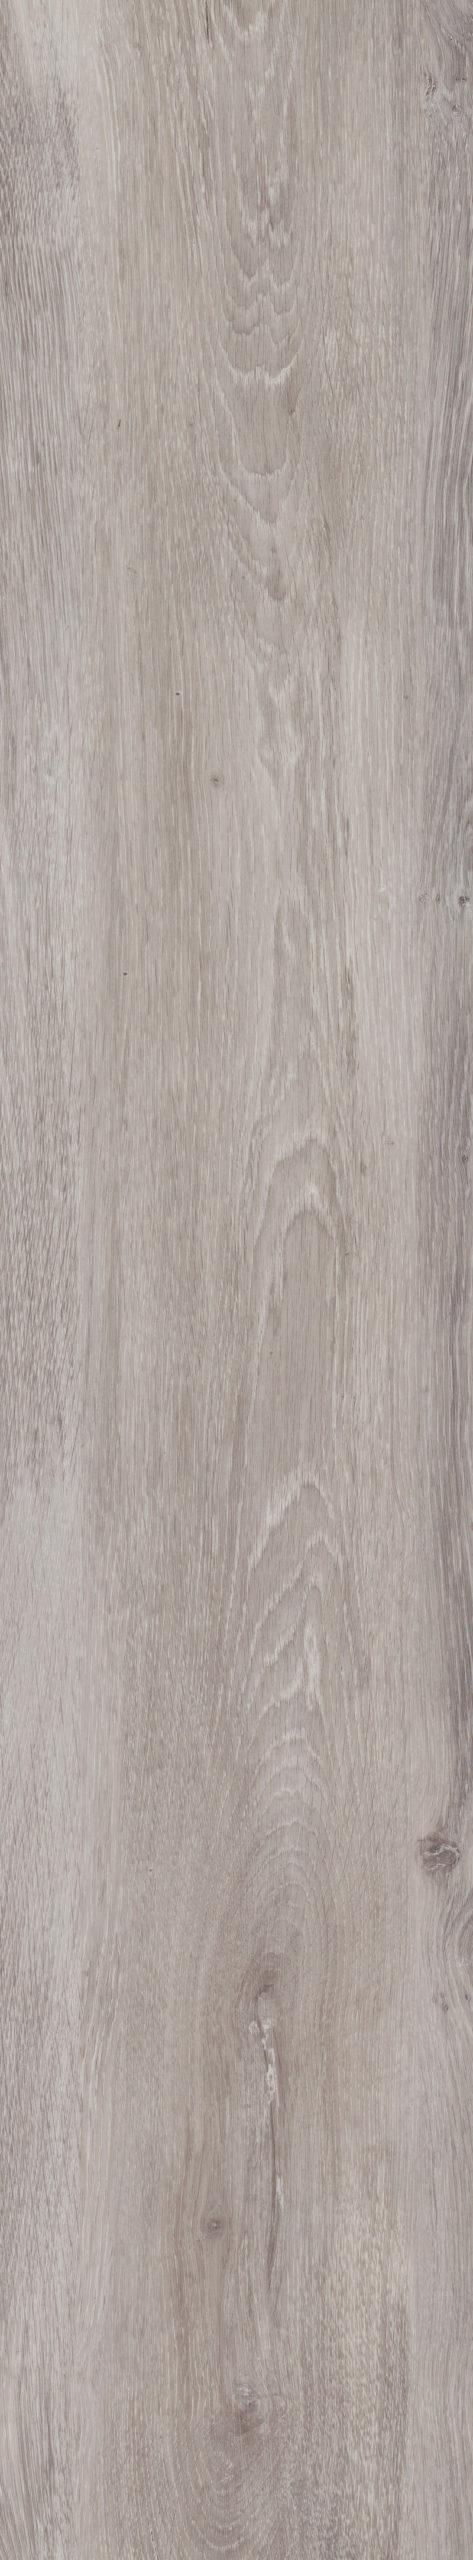 Reservoir Oak Foxcote